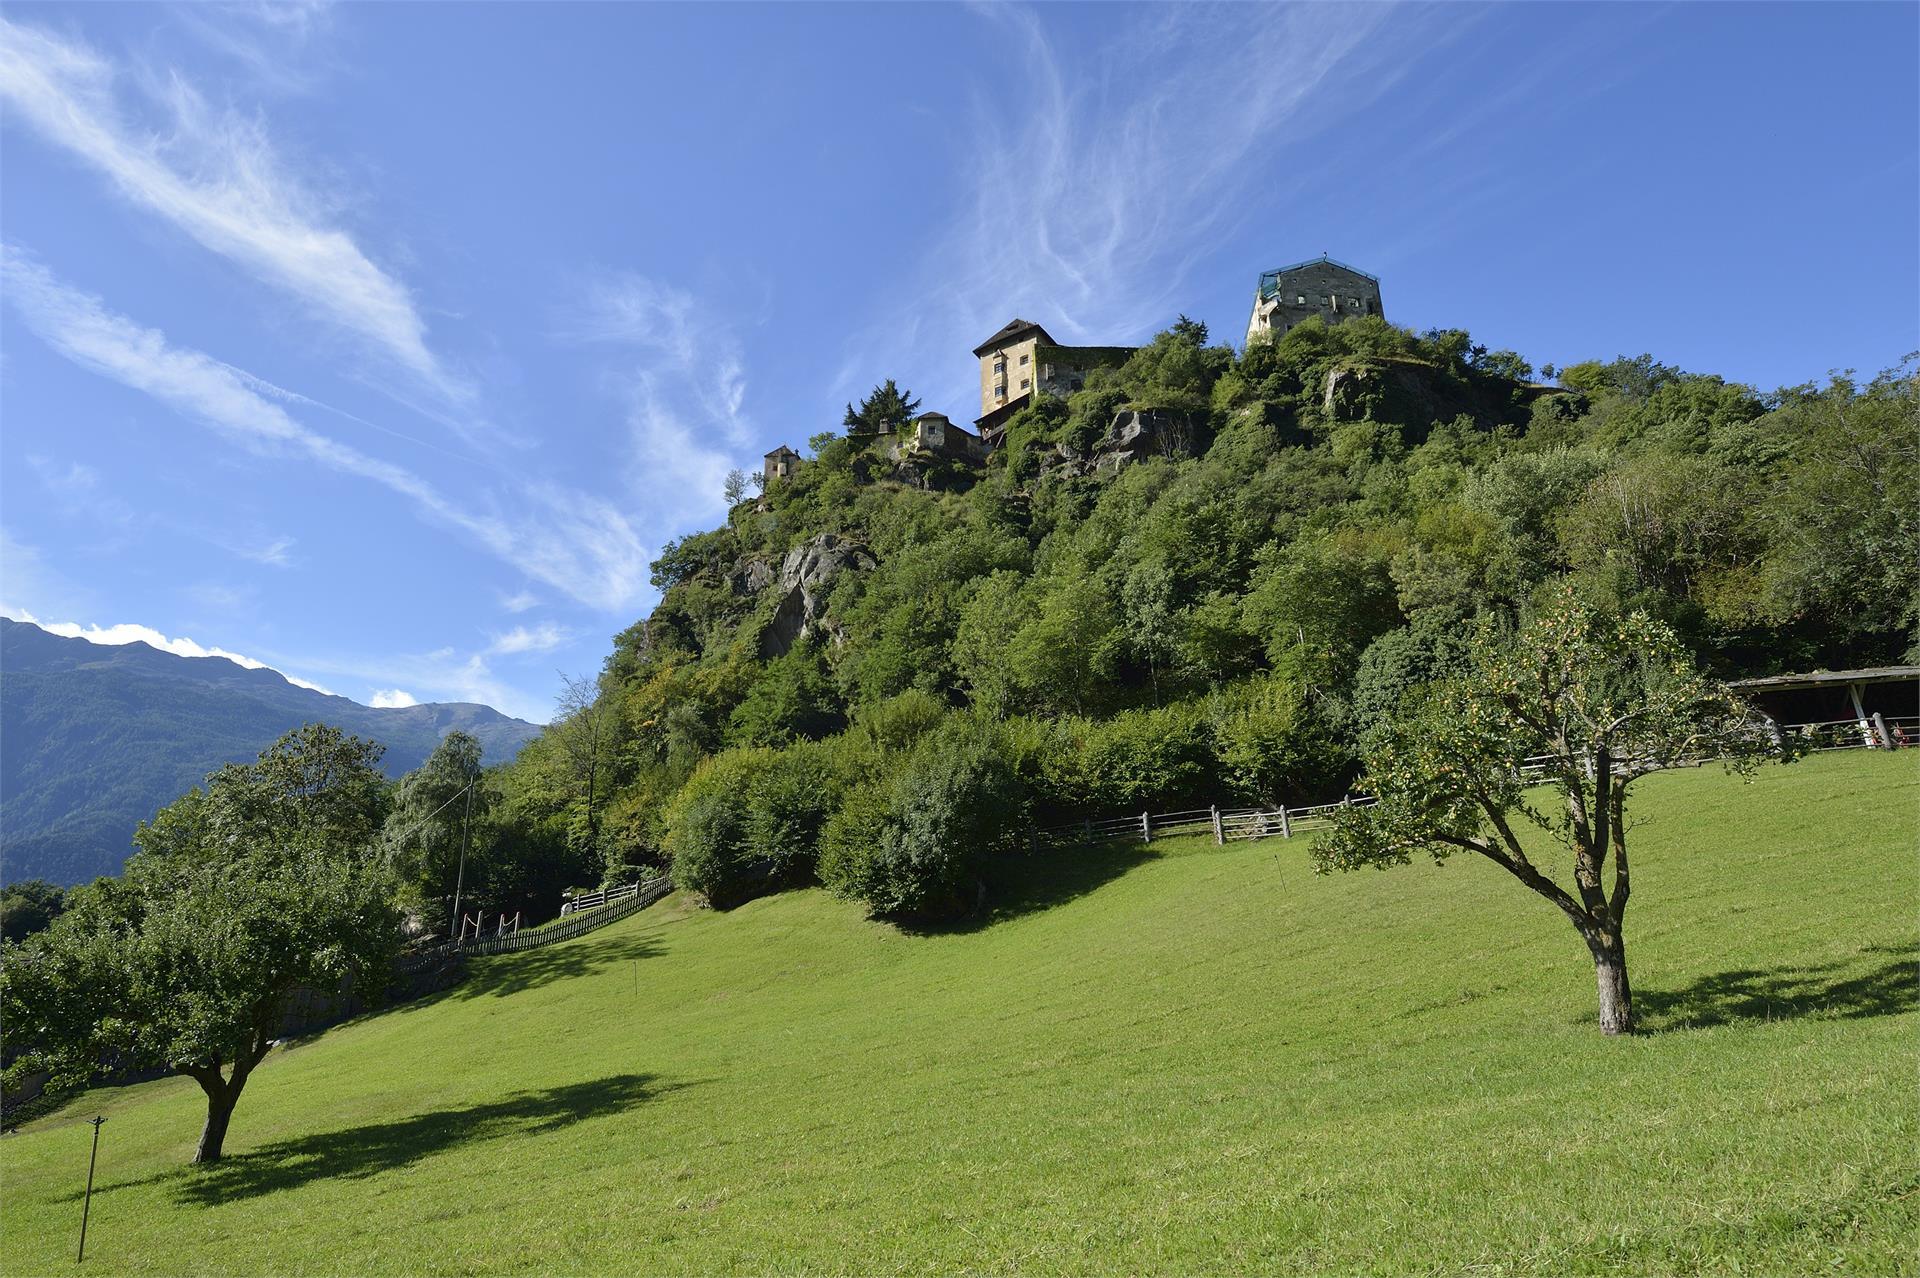 Climbing Park Juval